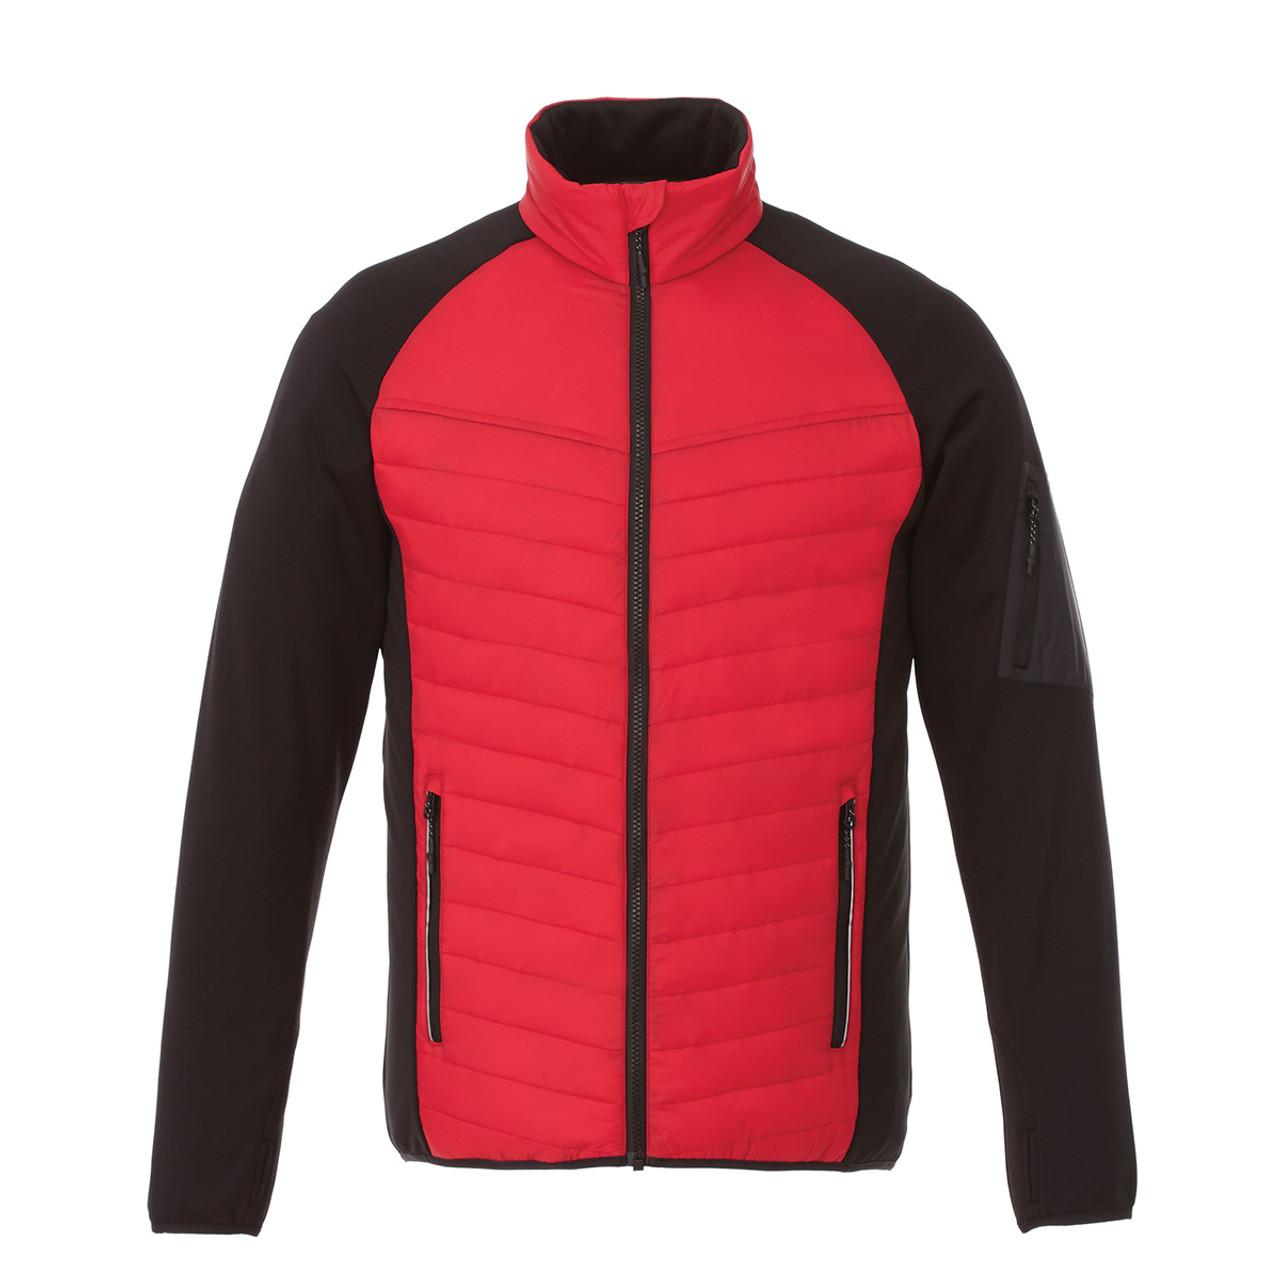 344852272ca Banff Men's Hybrid Insulated Jacket | Imprintables.ca